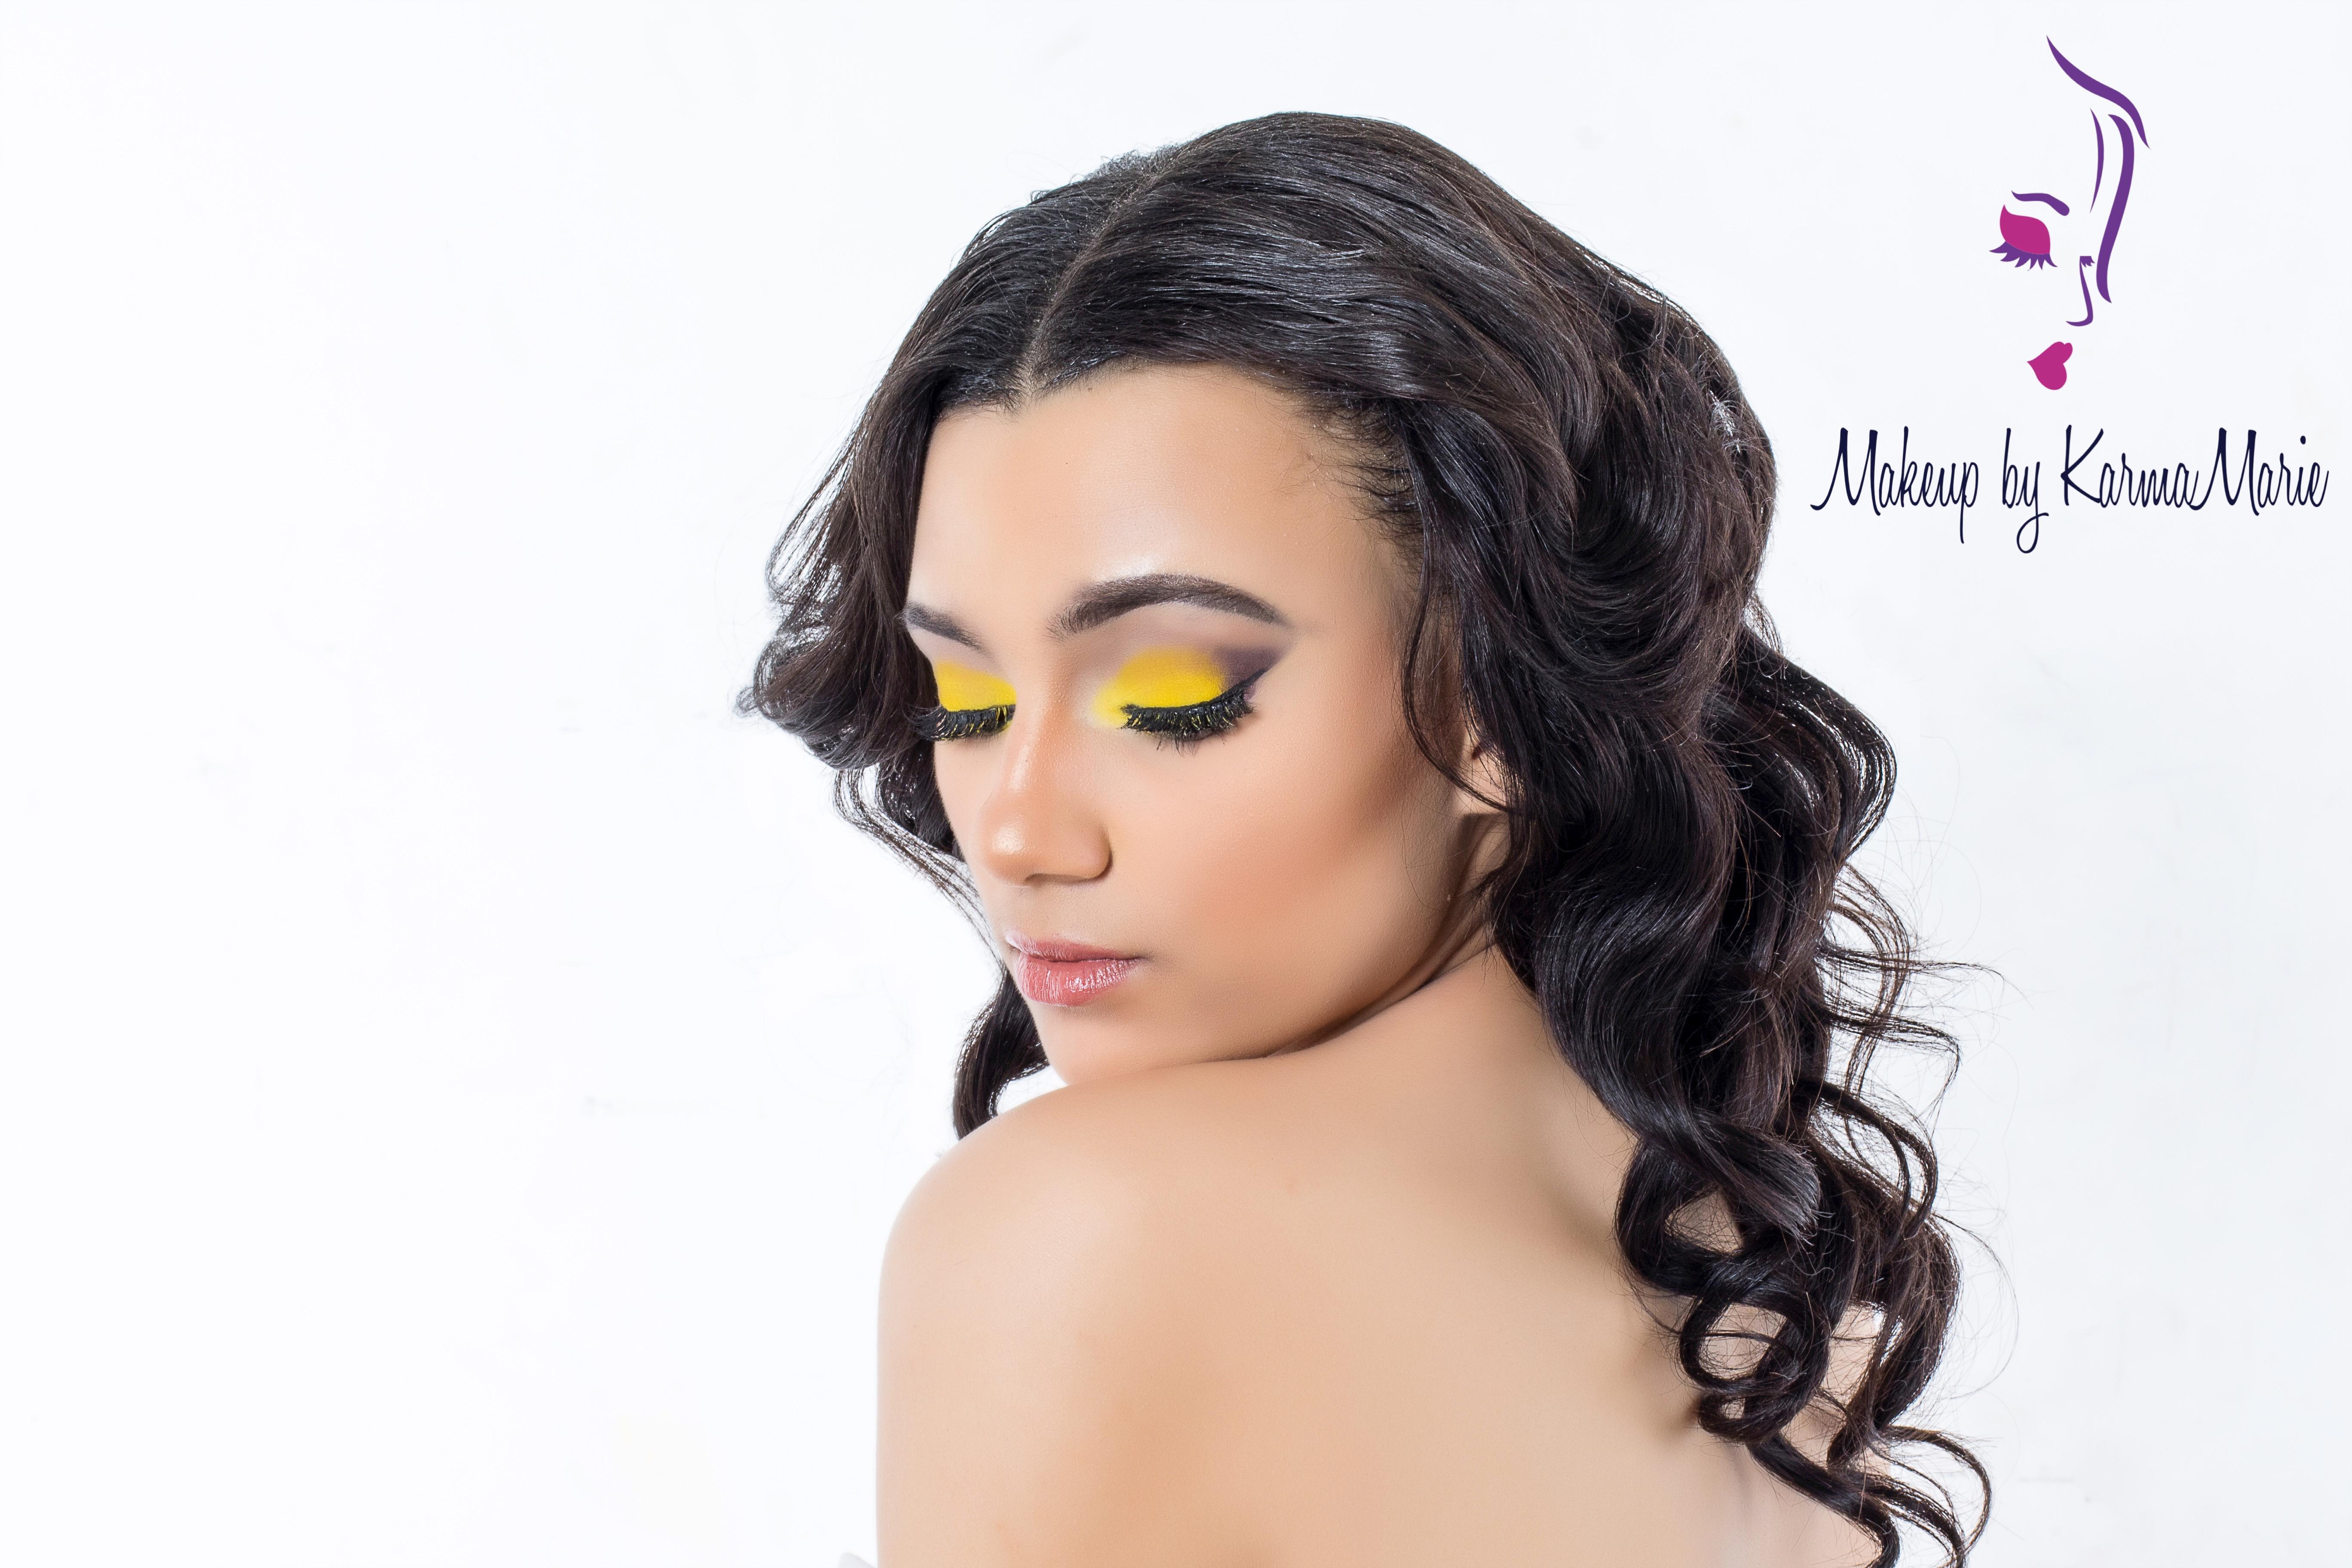 Make Up by Karma Marie